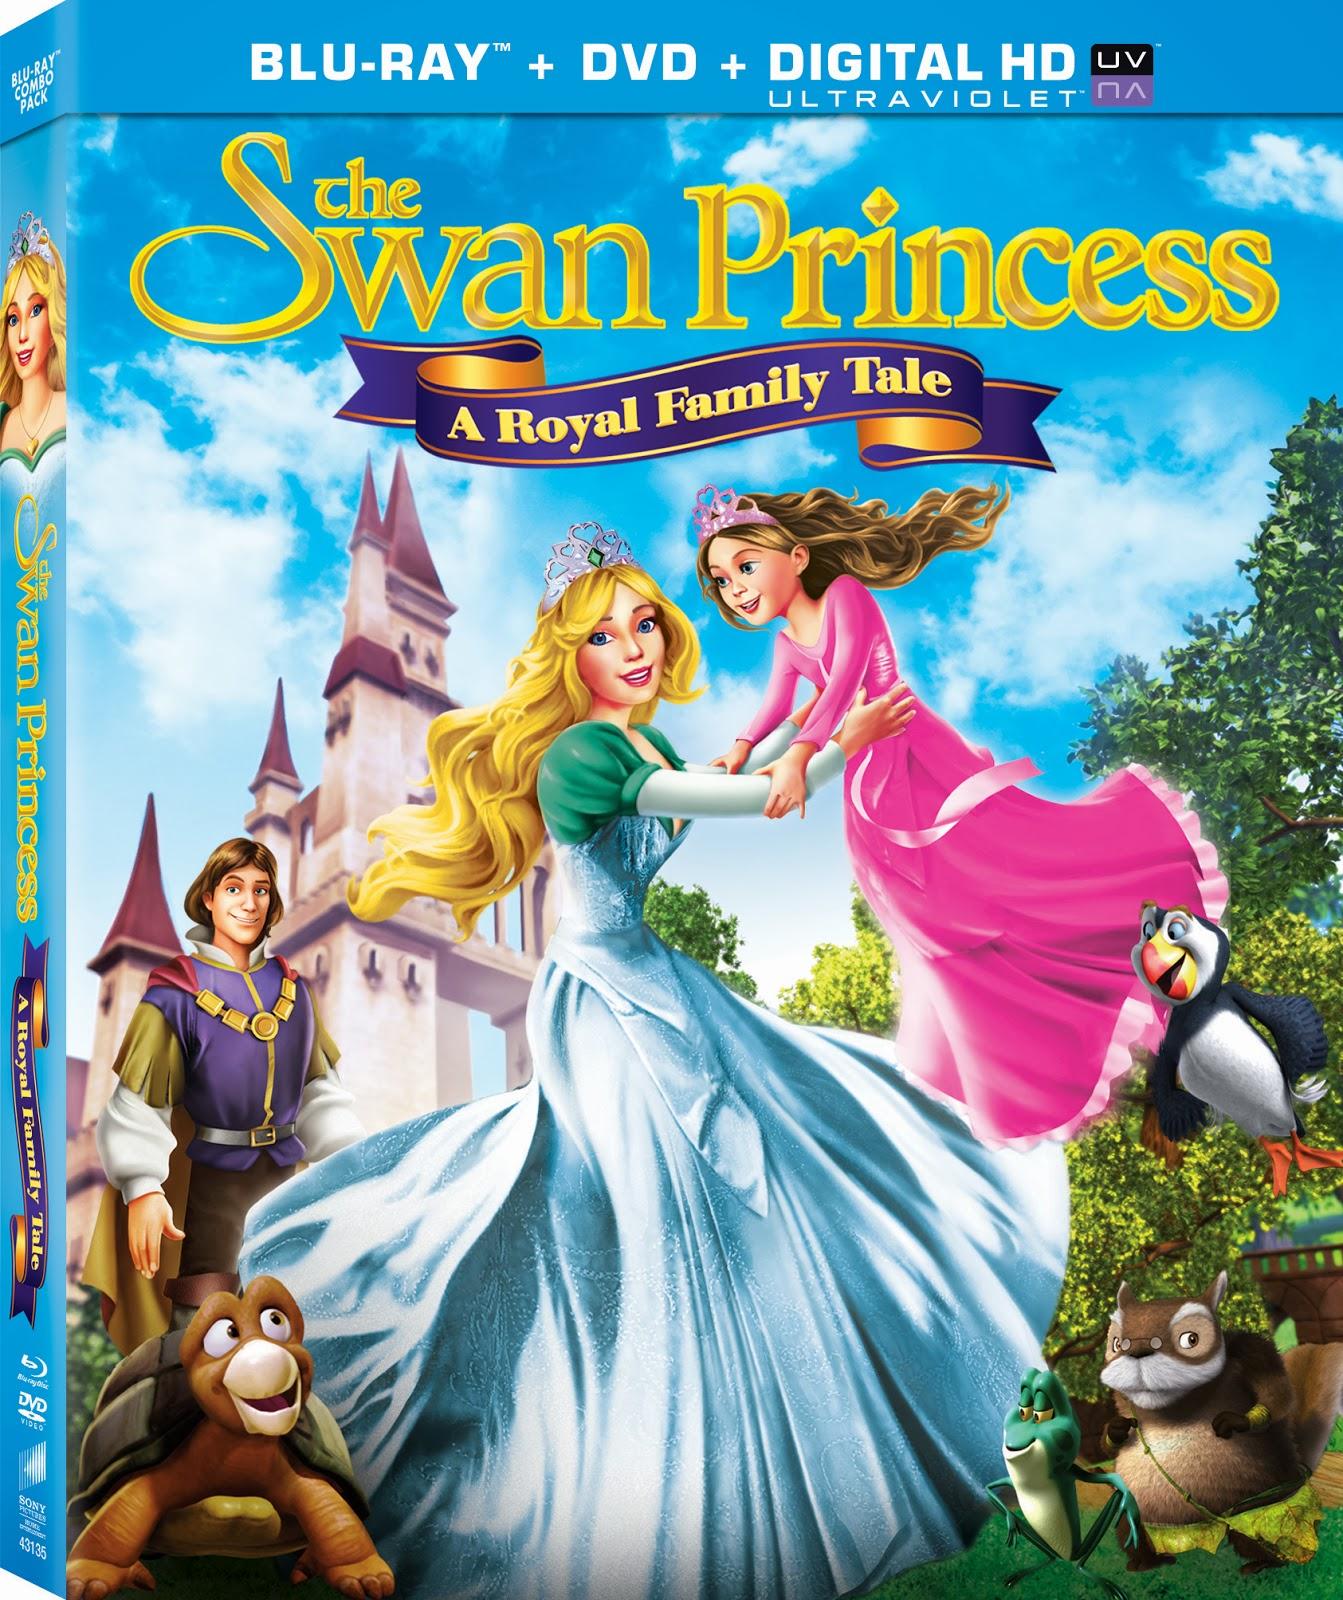 The Swan Princess Christmas.The Swan Princess A Royal Family Tale The Swan Princess